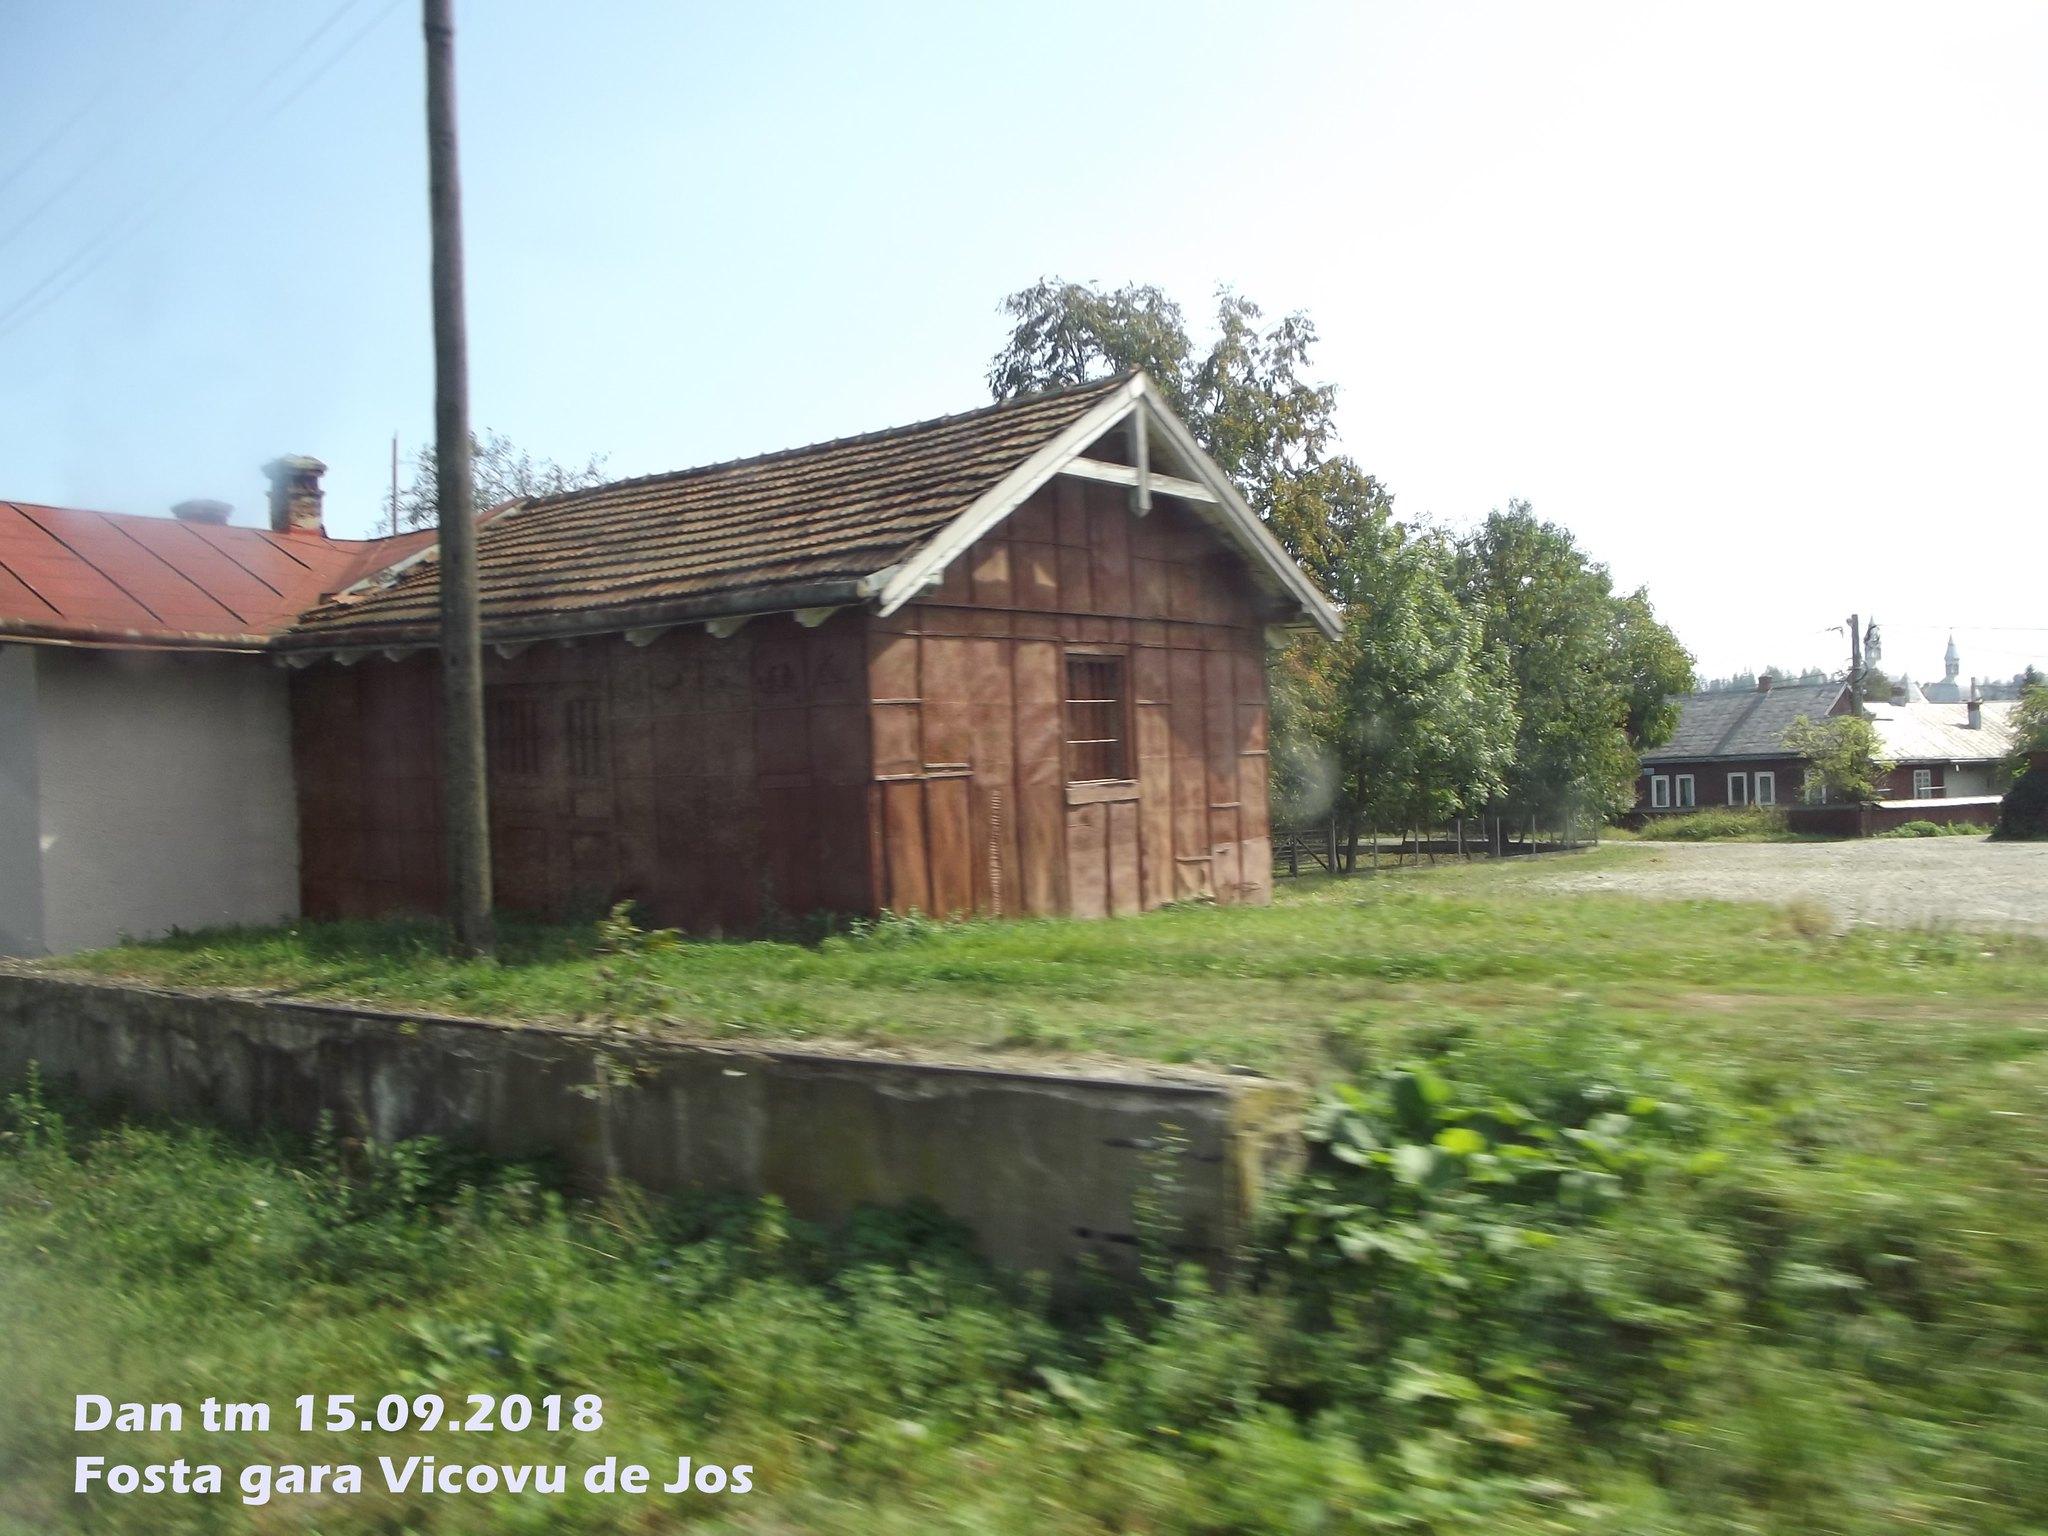 515 : Dorneşti - Gura Putnei - (Putna) - Nisipitu - Seletin UKR - Pagina 47 44016735444_26a7e2f48b_k